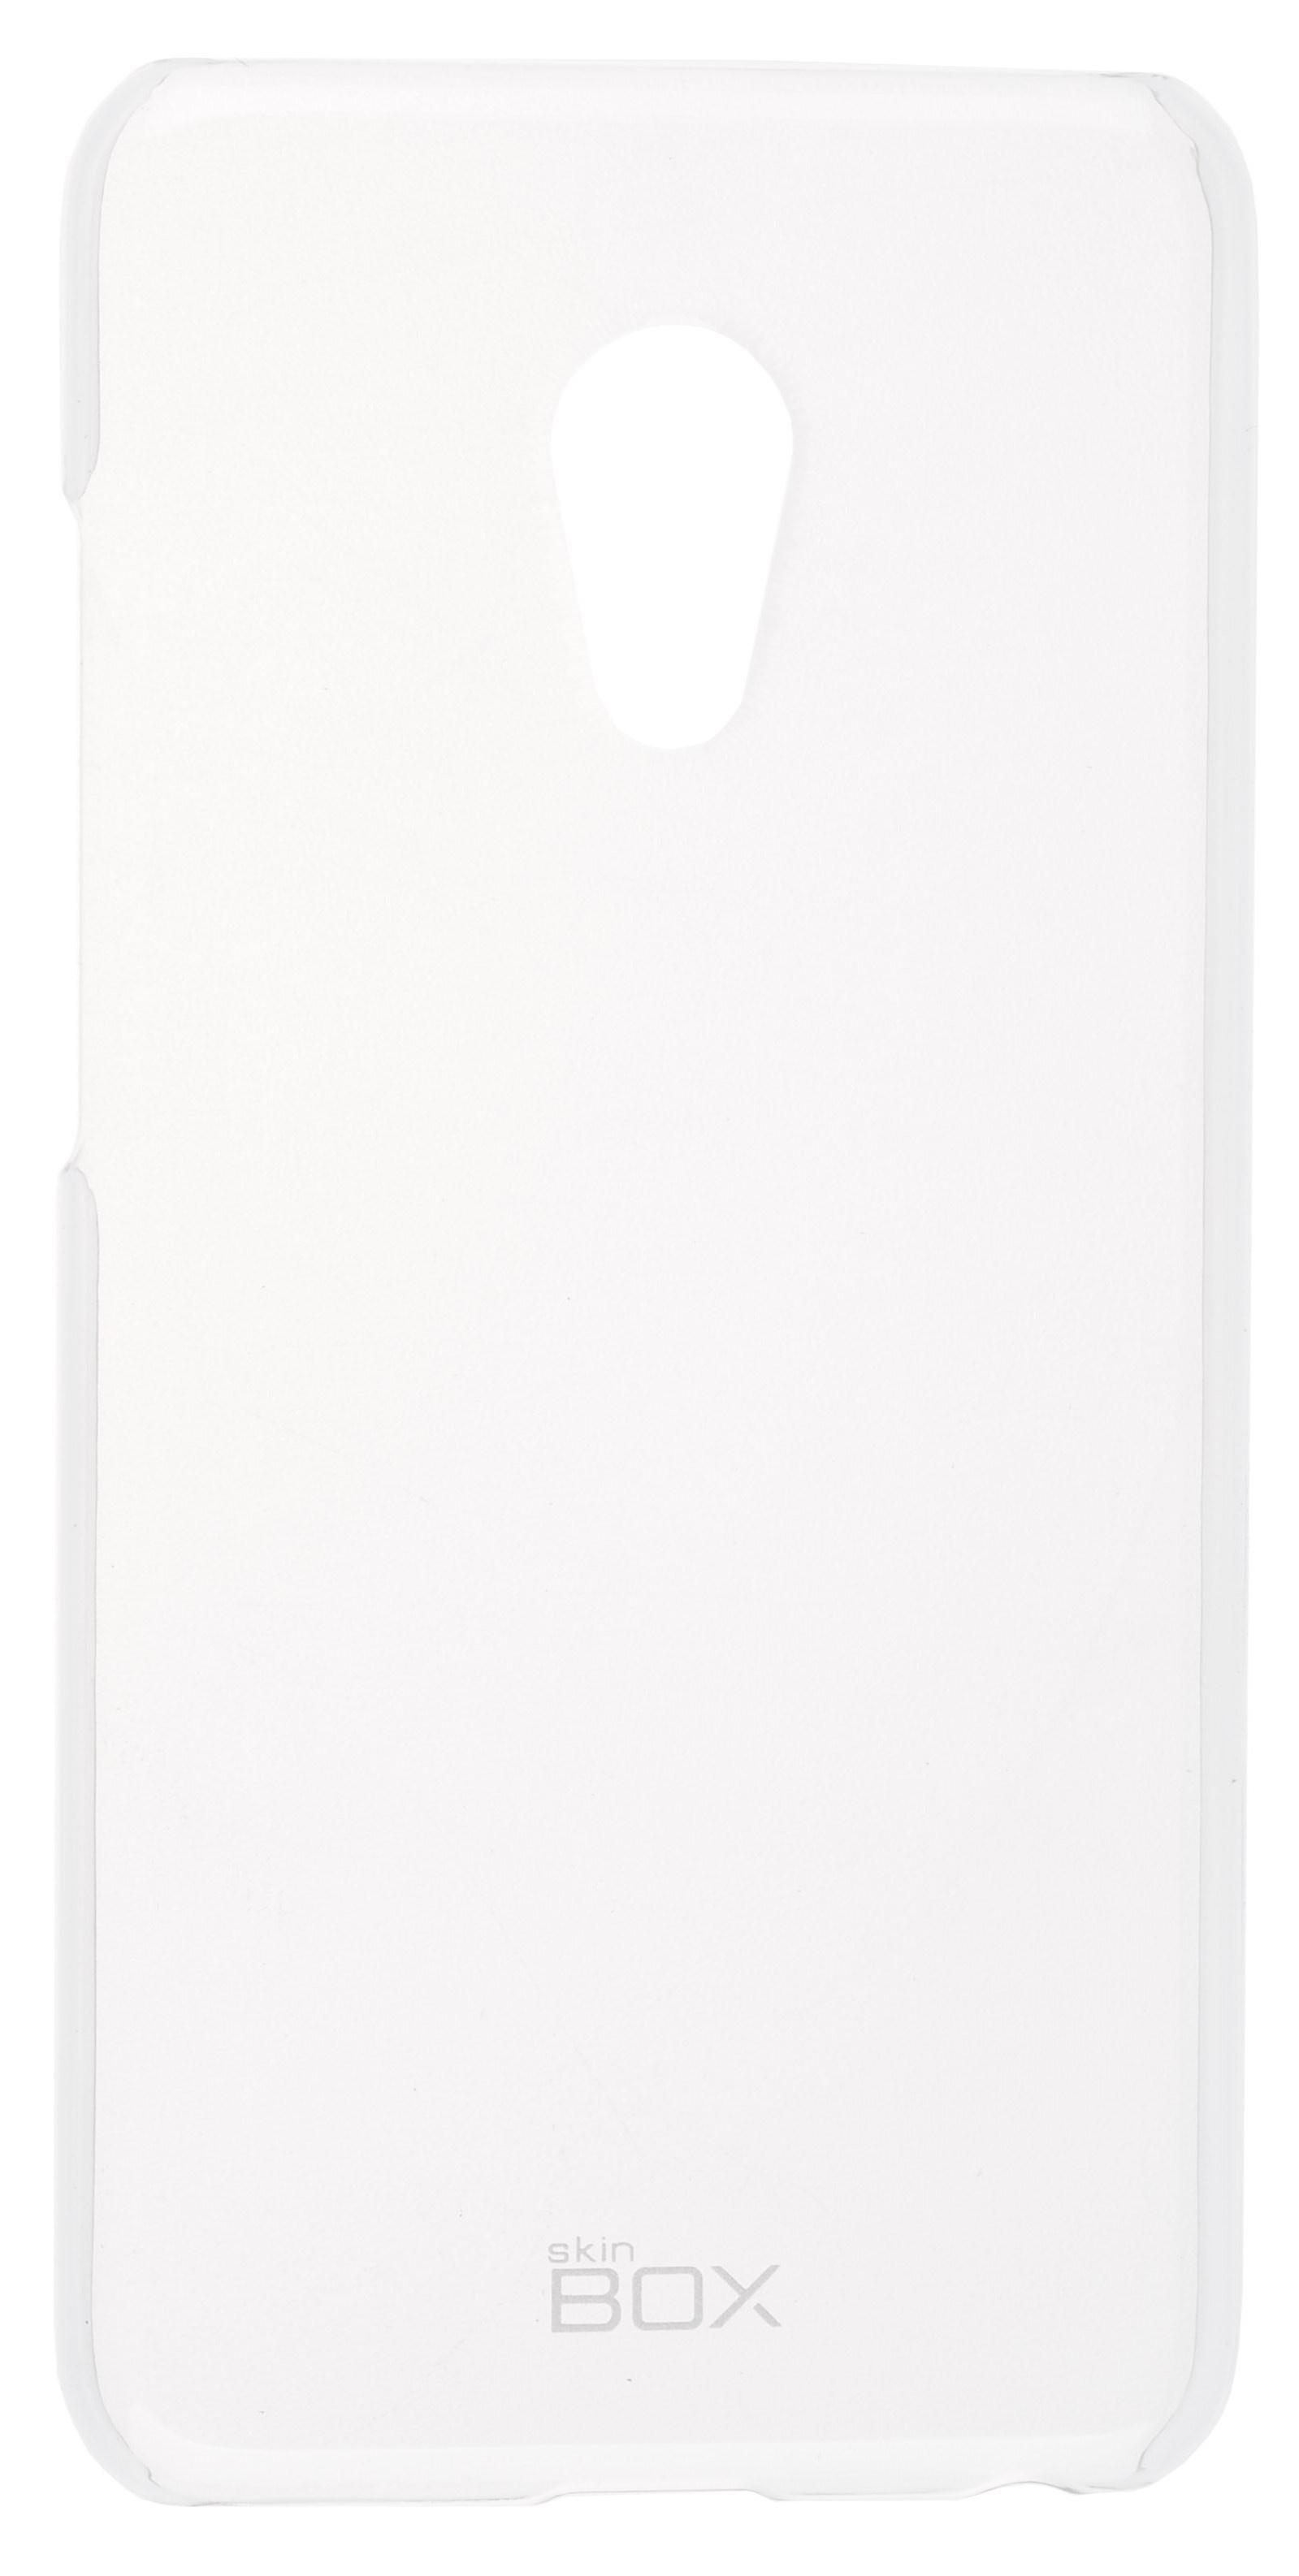 Чехол для сотового телефона skinBOX Crystal, 4630042528017, прозрачный чехол защитный skinbox samsung galaxy j7 prime galaxy on7 sm g600f